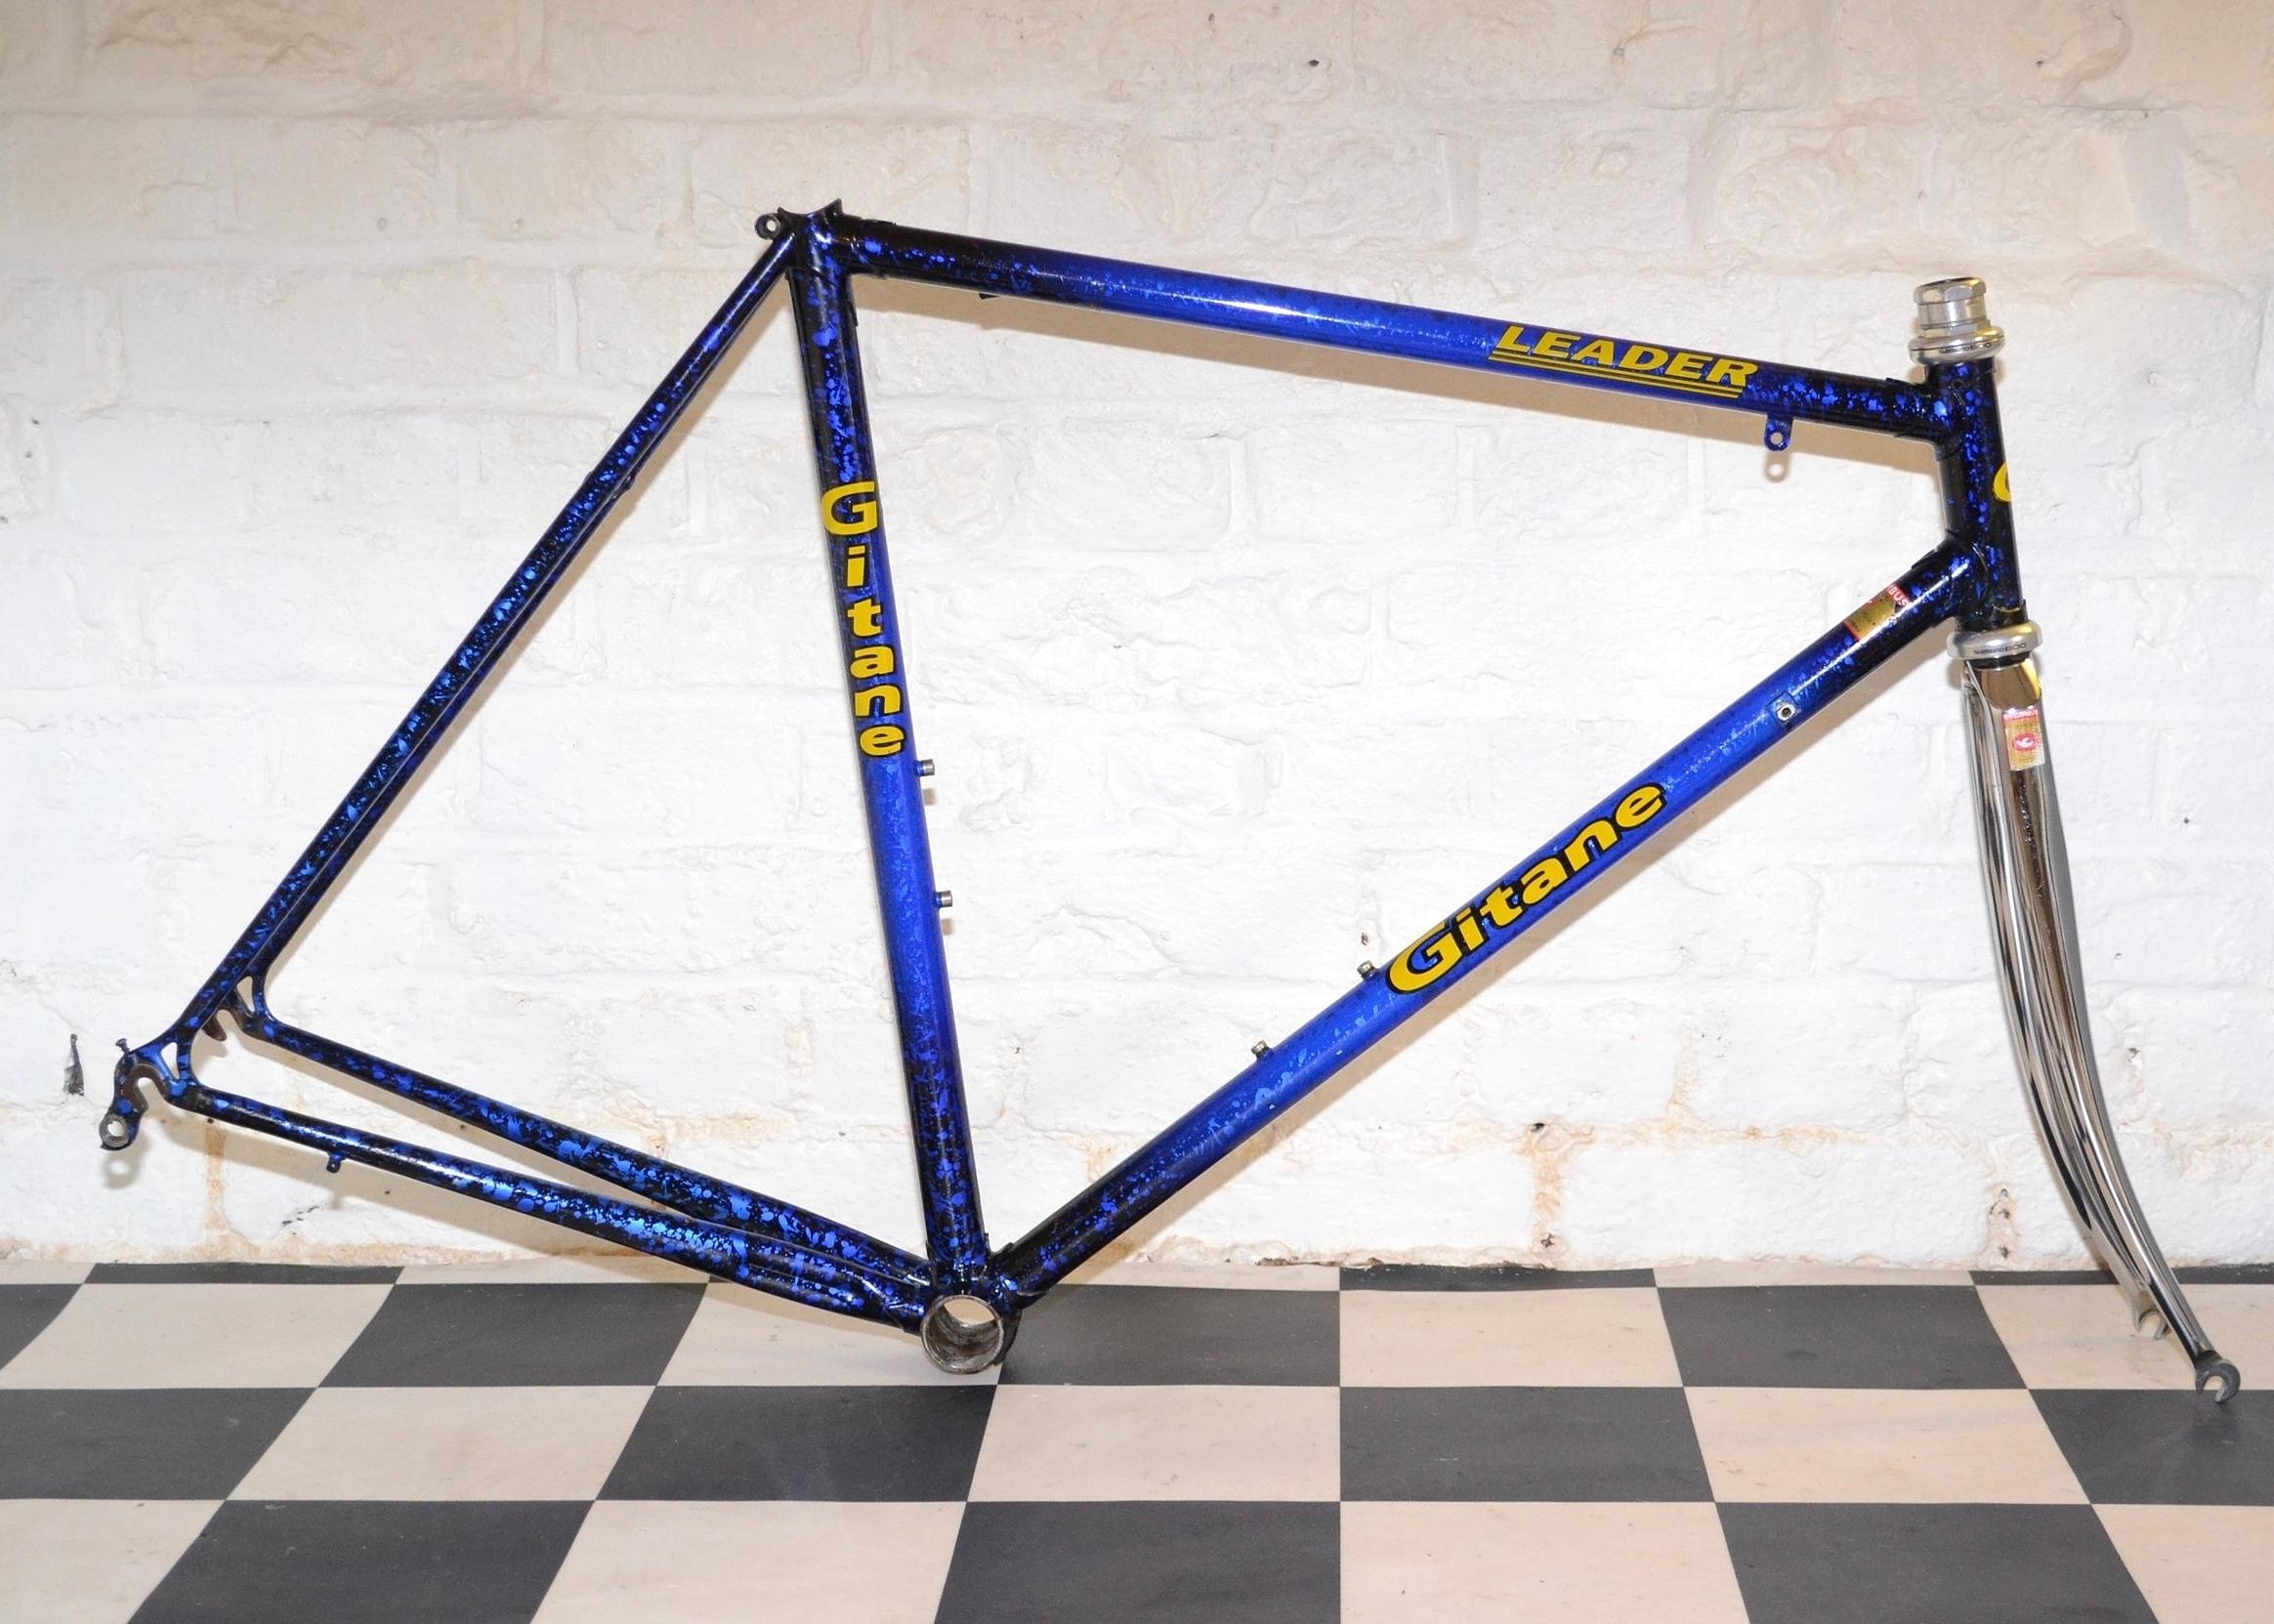 Gitane_Leader_ColumbusSLX_53cm_Big_Fun_Bikes.jpg